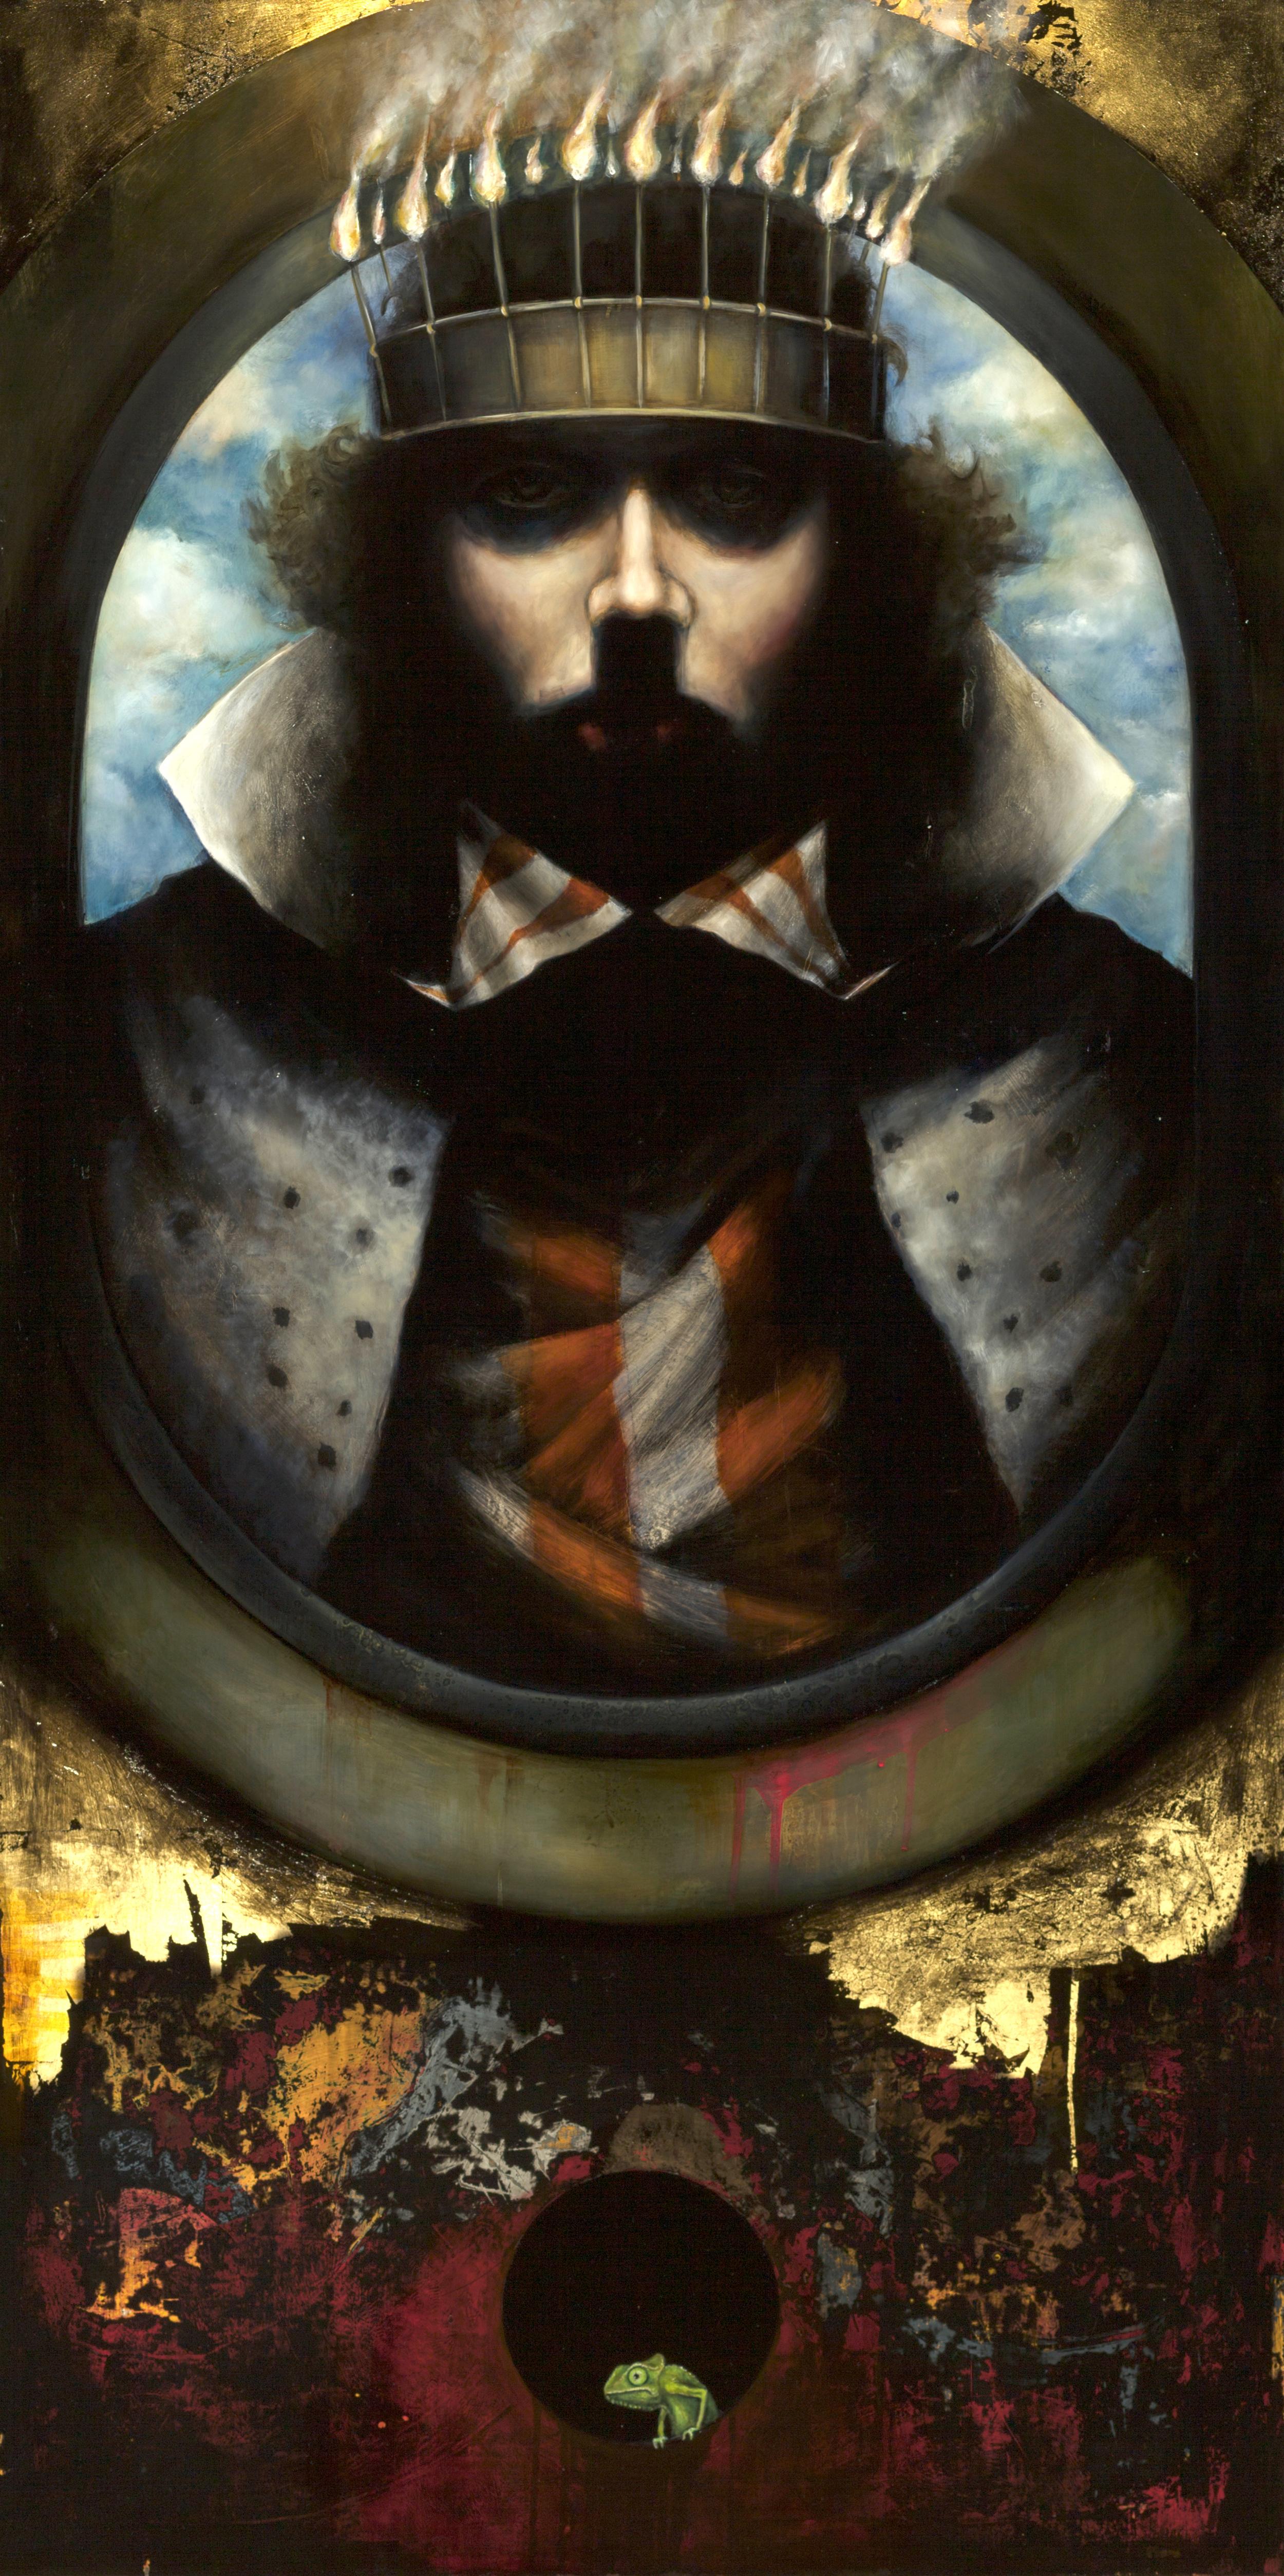 The King (Capricorn)